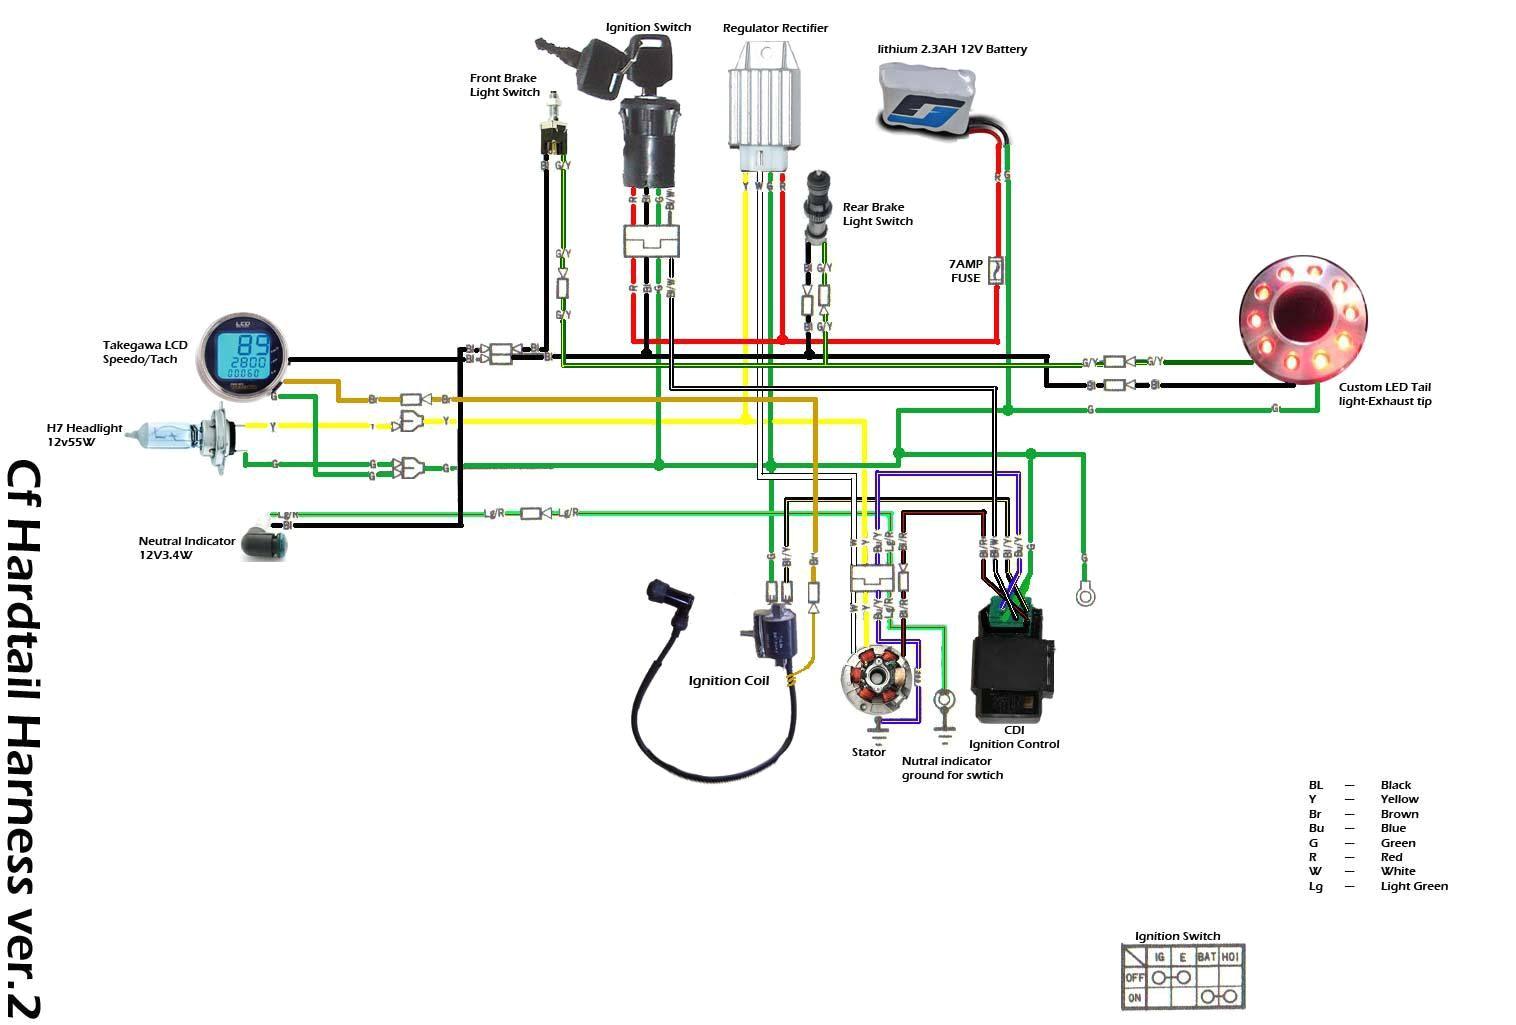 Chinese atv Wiring Harness Diagram Bashan atv Wiring Diagram Wiring Diagram Center